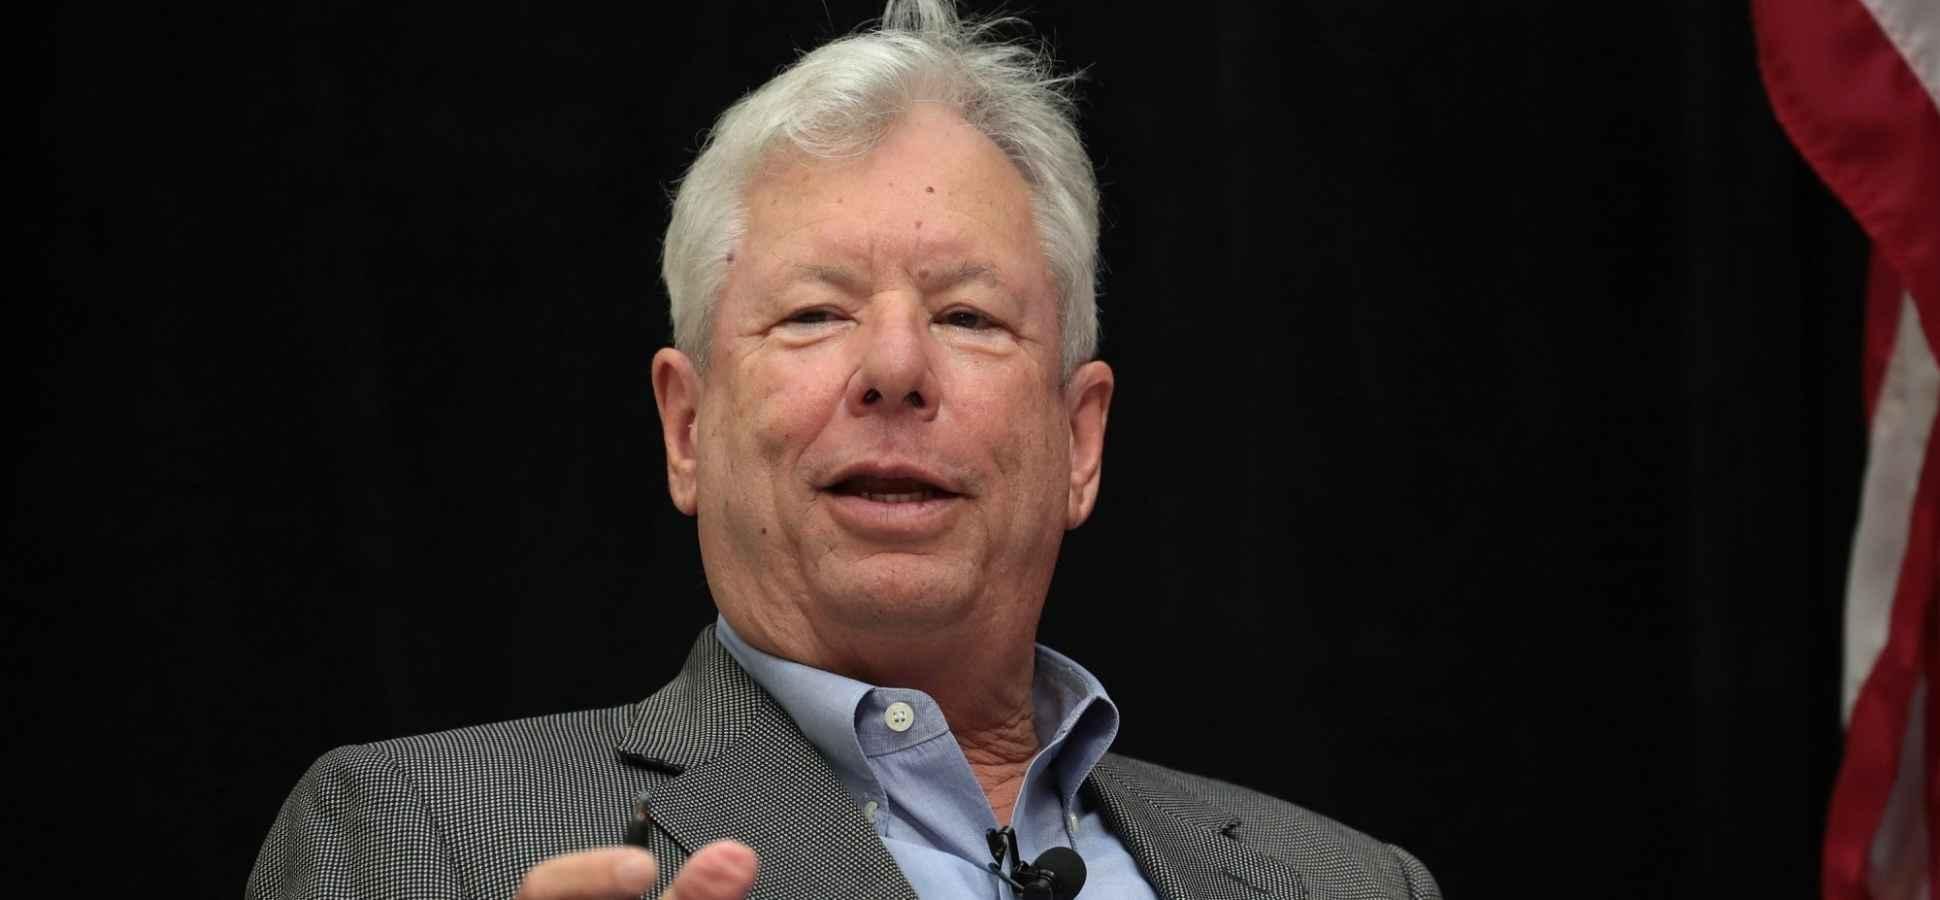 In 3 Words, Nobelist Richard Thaler Shares the Secret of Effective Communication